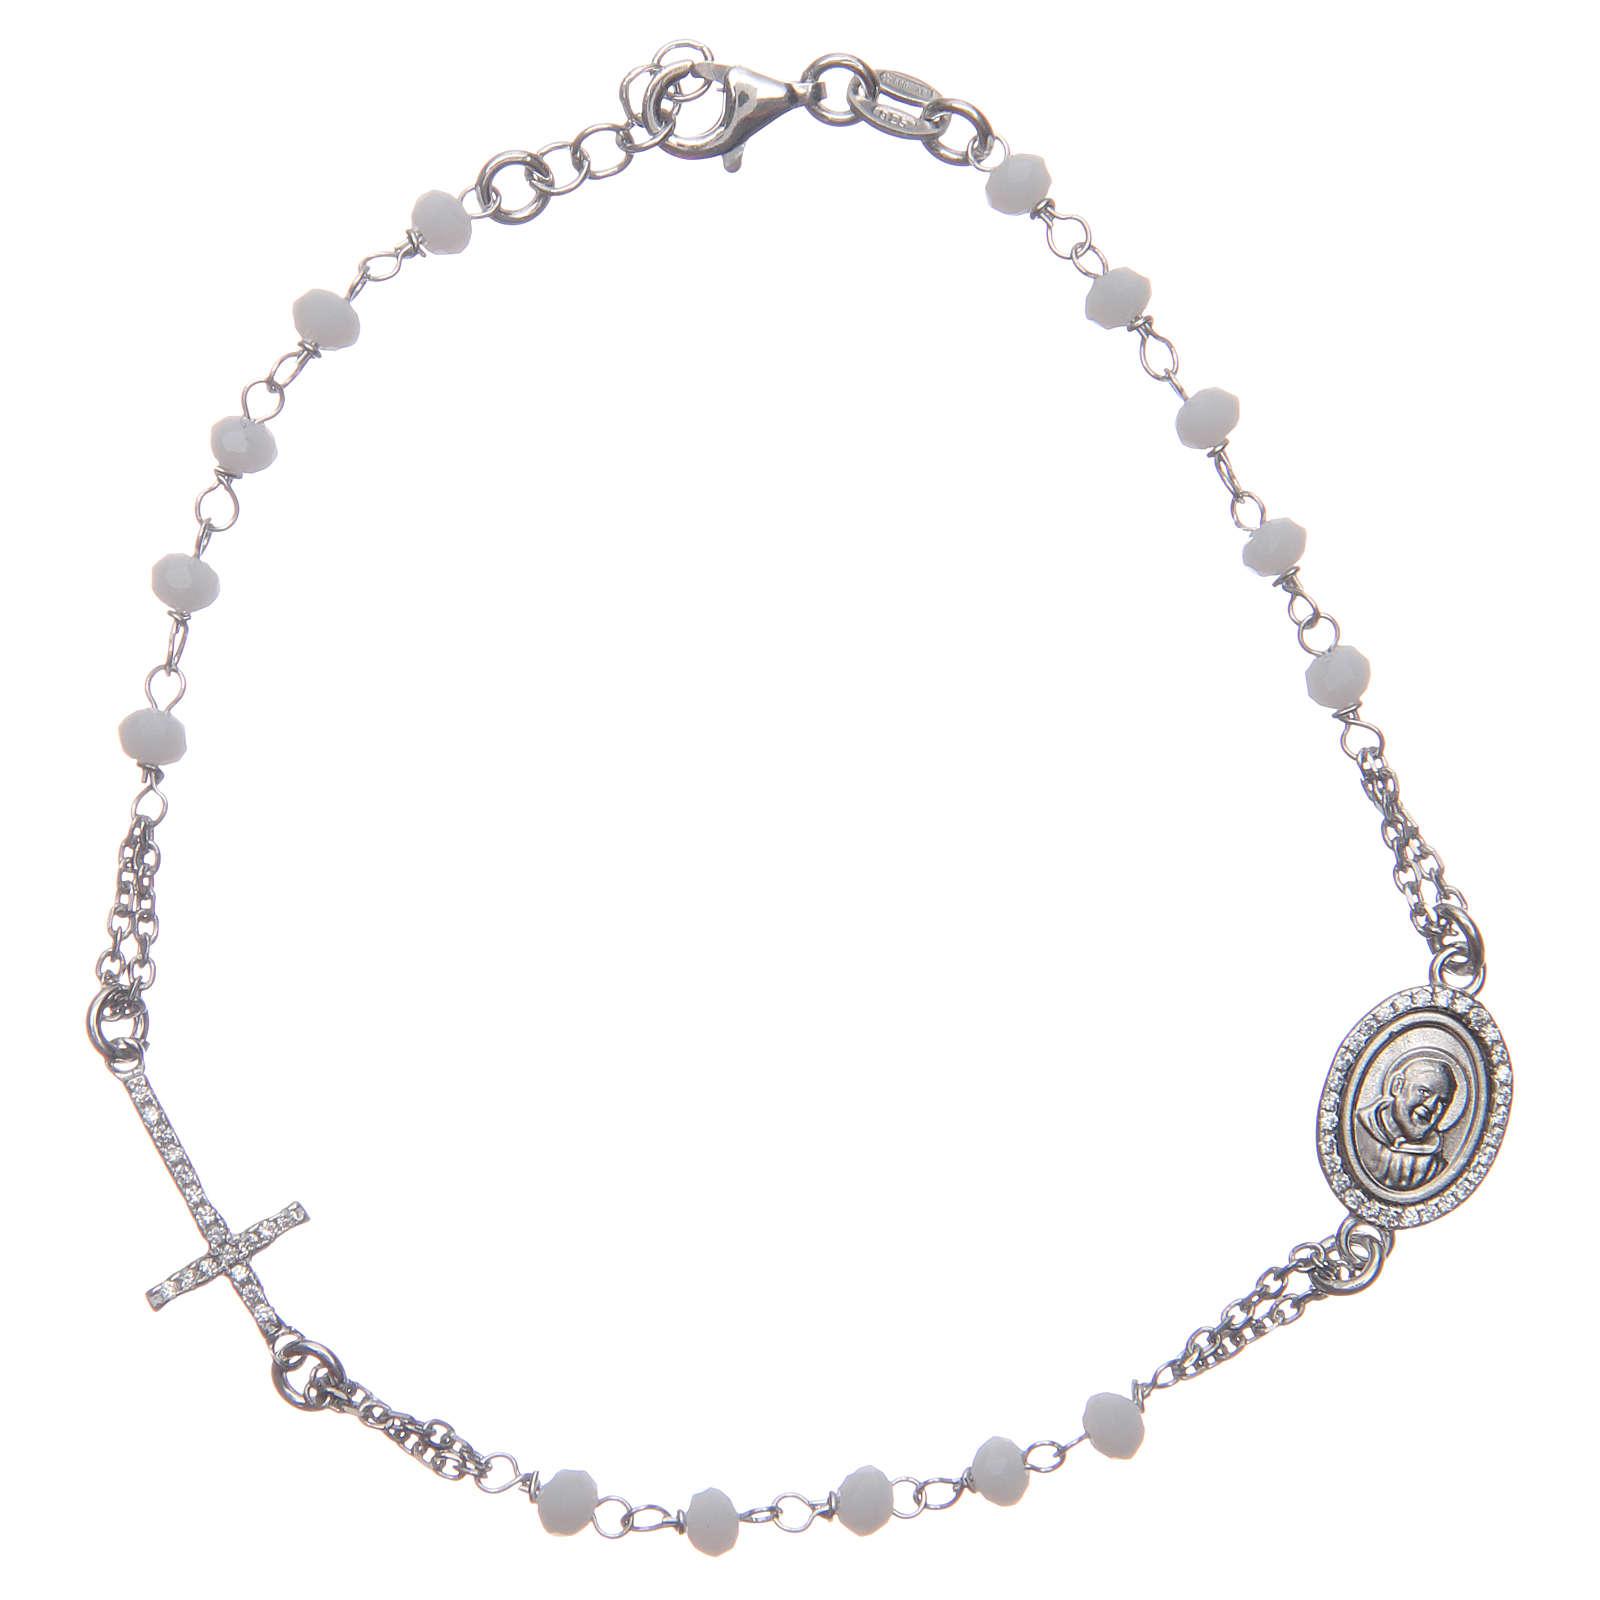 Bracciale rosario Padre Pio bianco zirconi bianchi argento 925 4